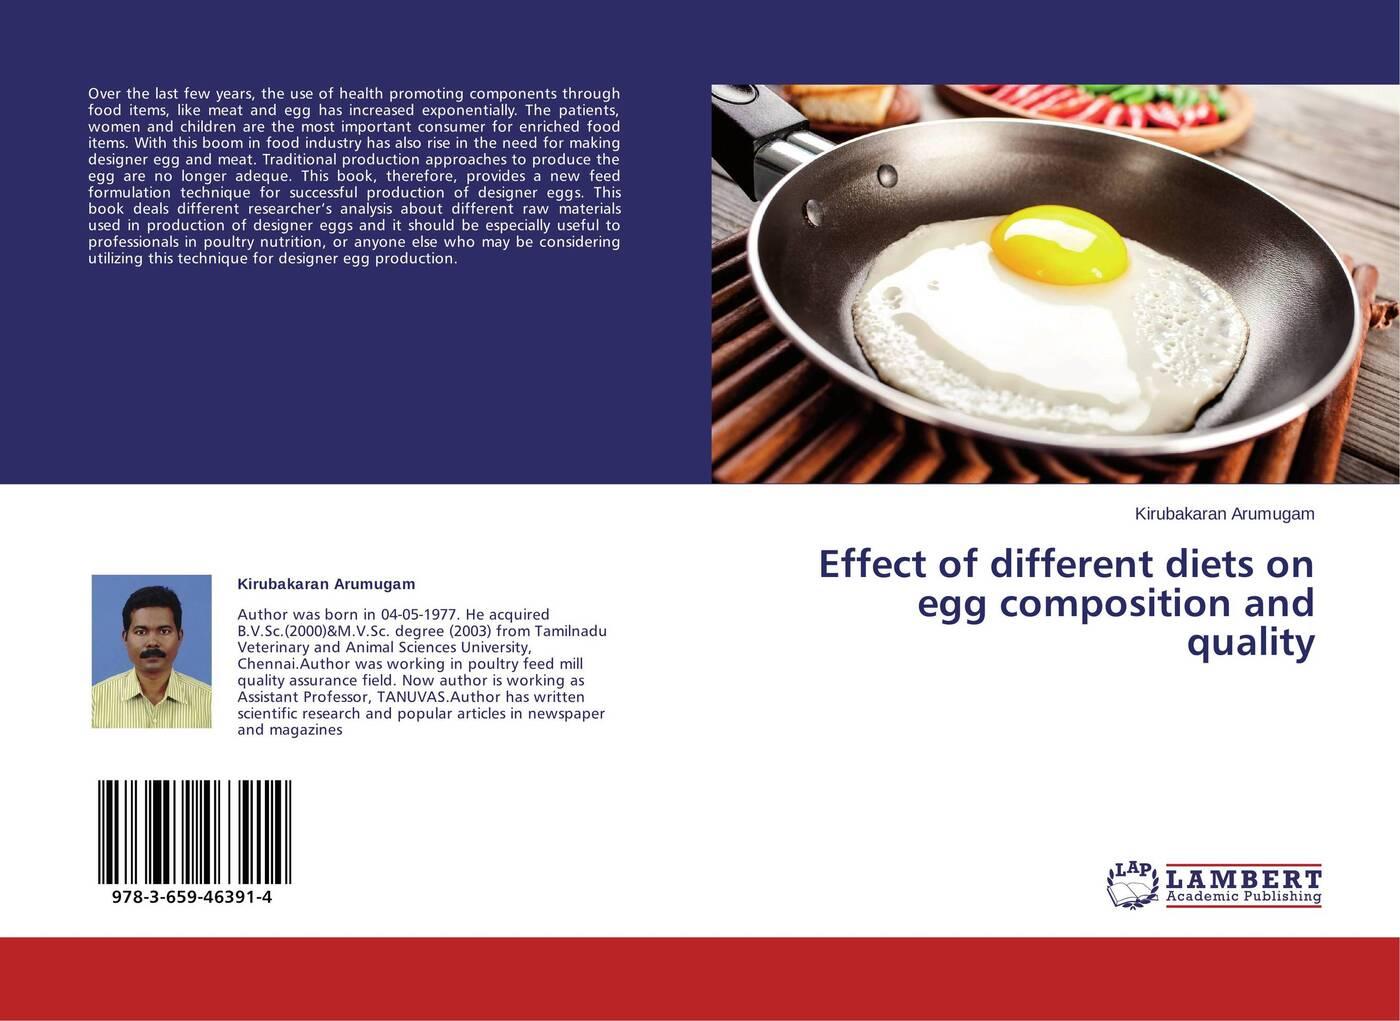 лучшая цена Kirubakaran Arumugam Effect of different diets on egg composition and quality